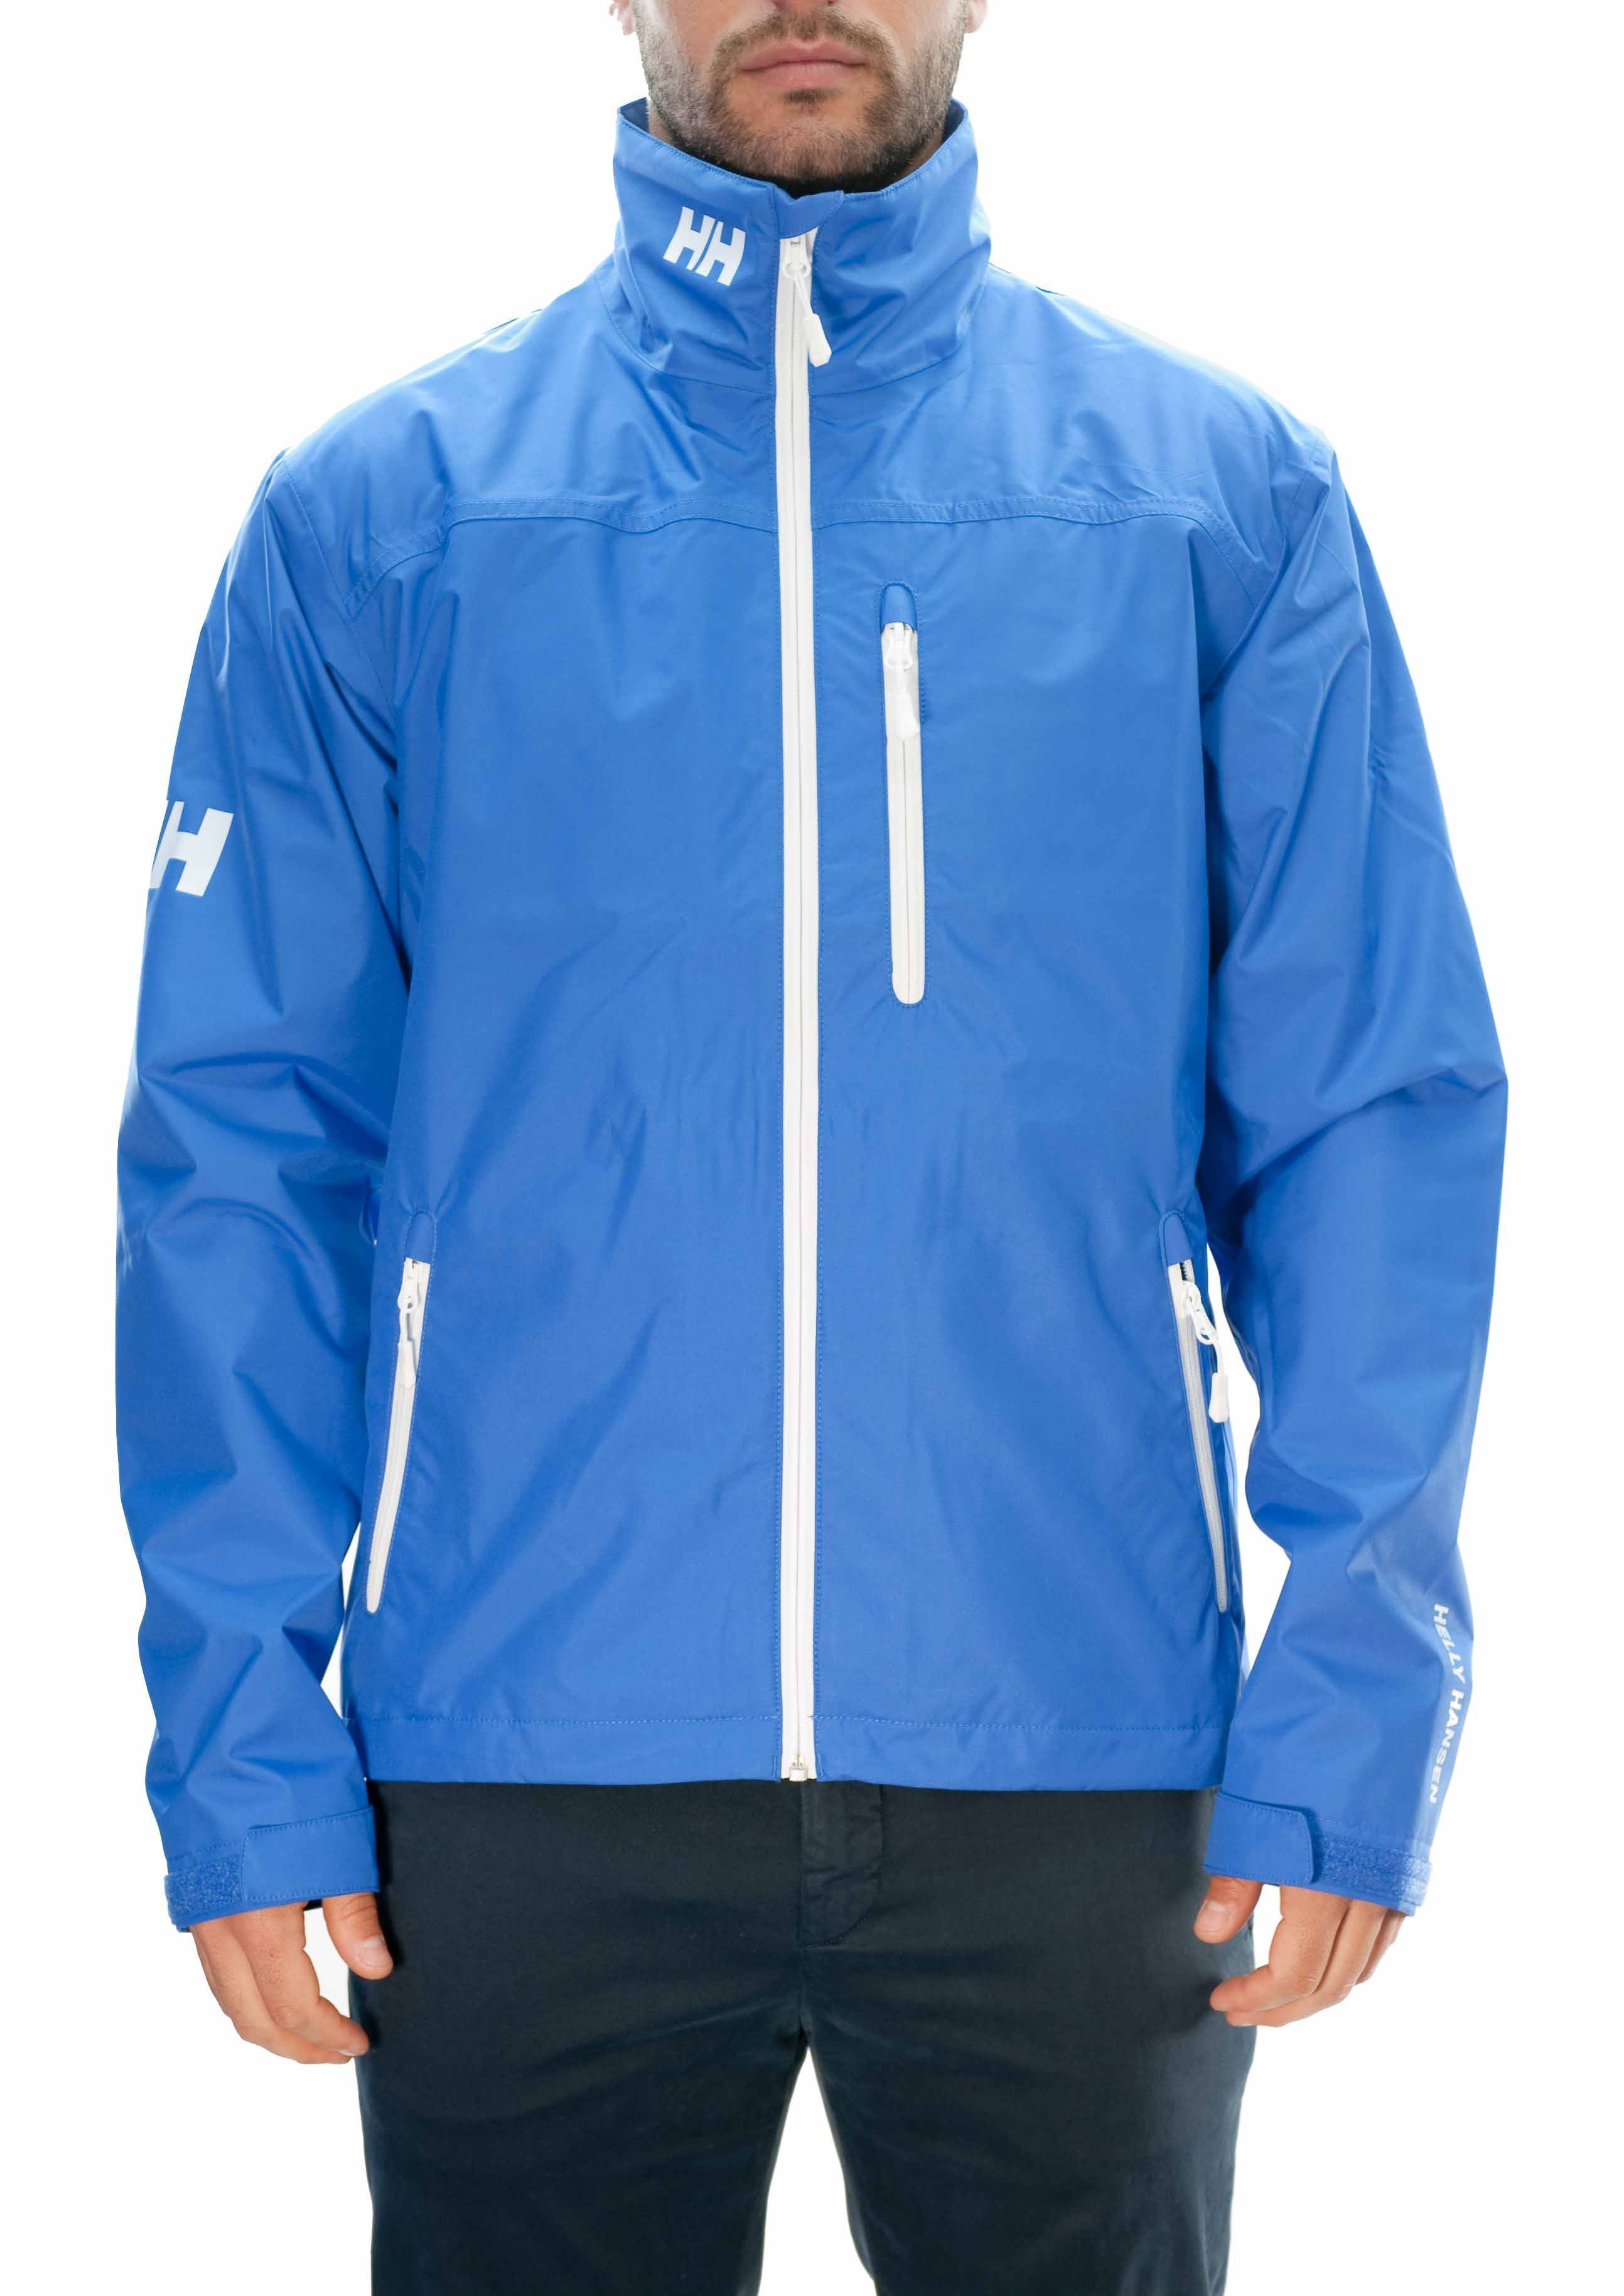 Immagine di Royal Blue crew jacket